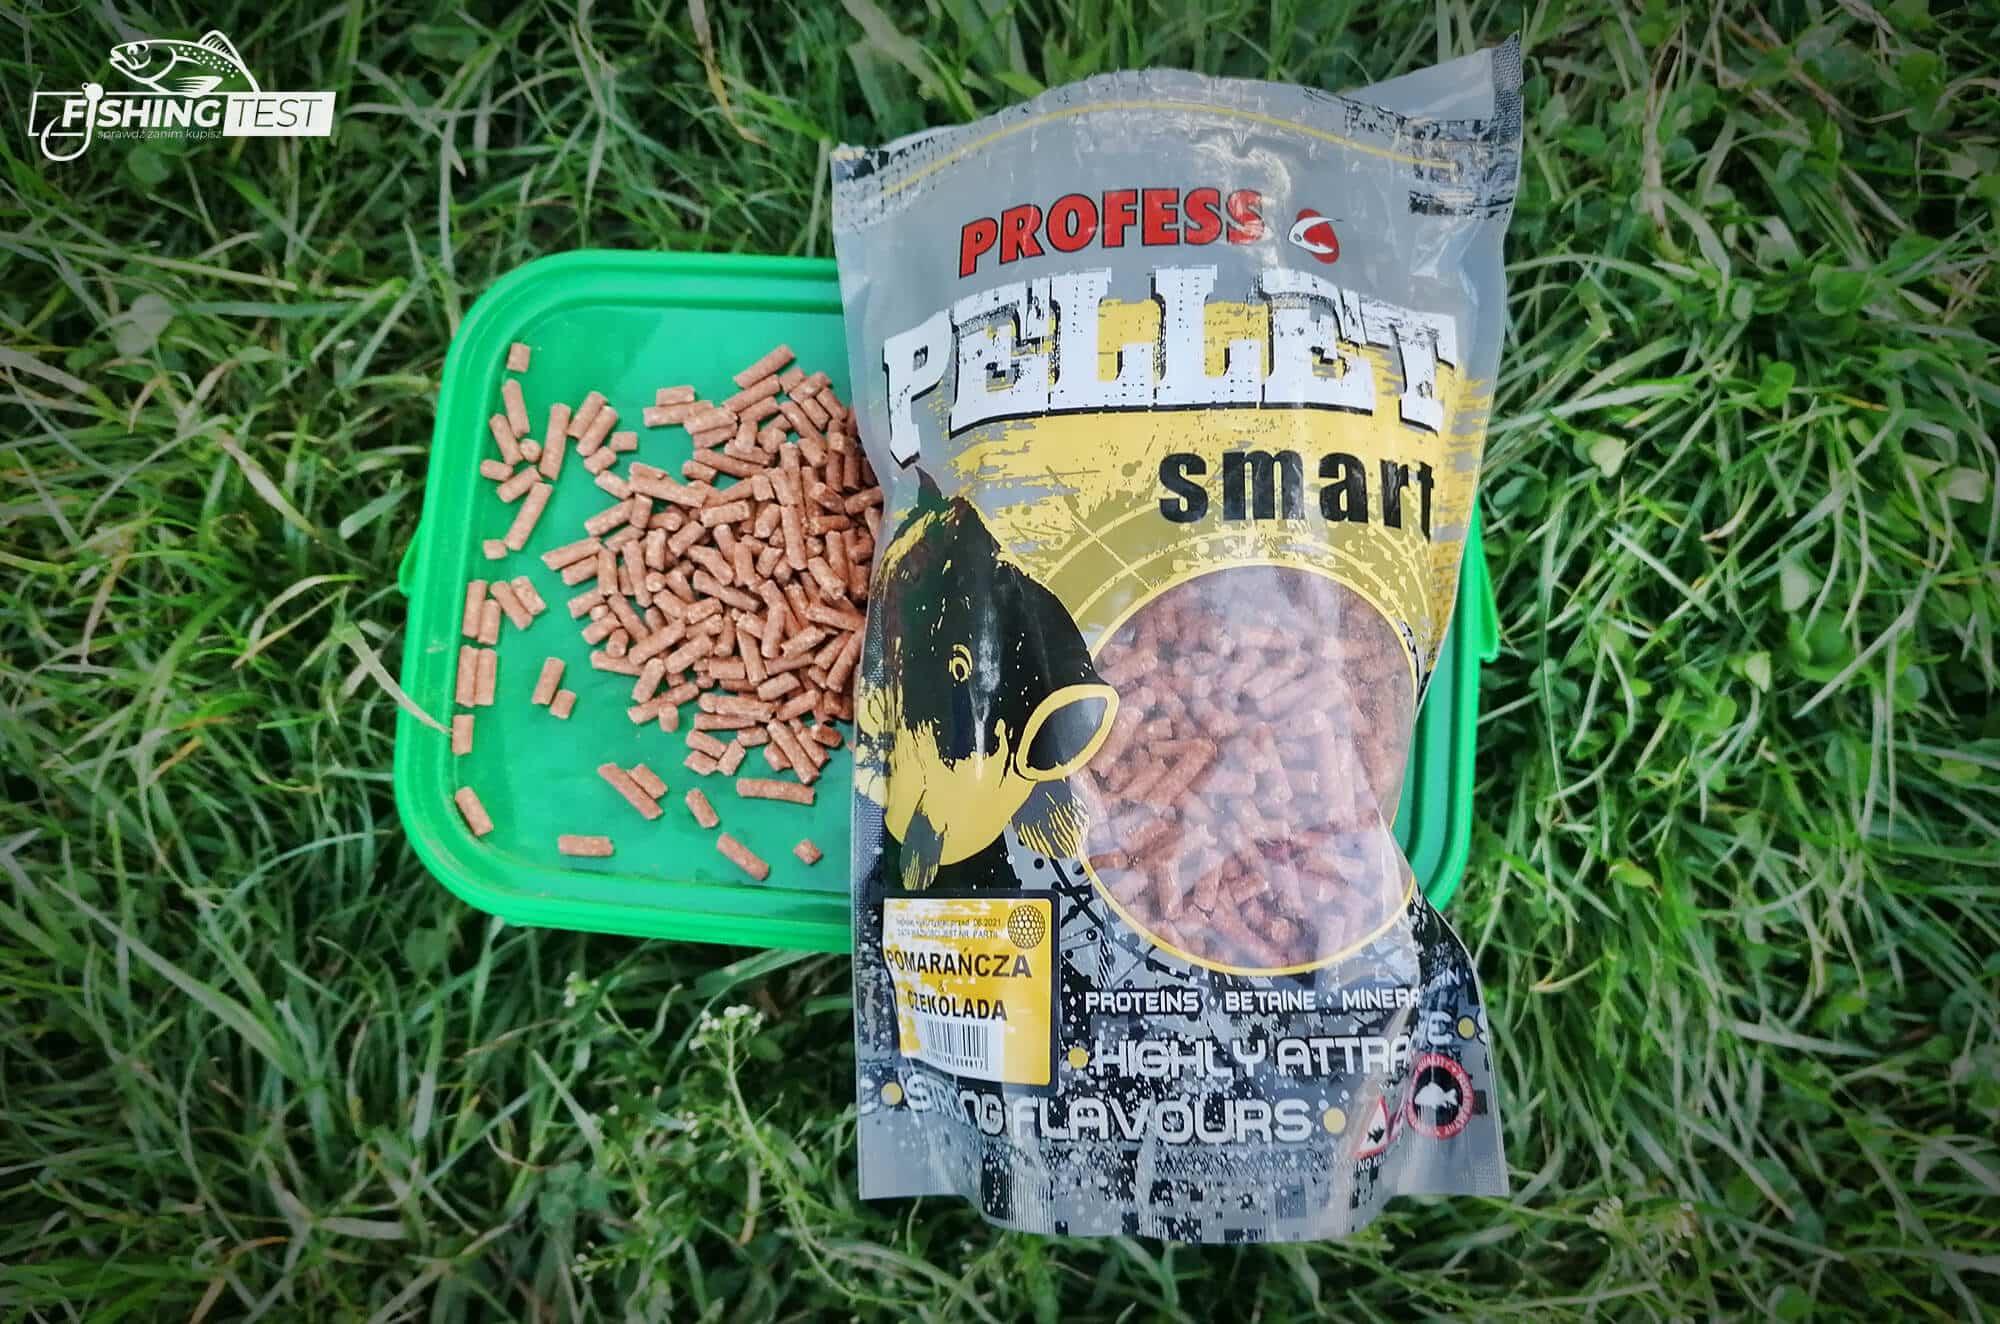 Granulat, pellet smart i pellet w pudełku firmy Profess